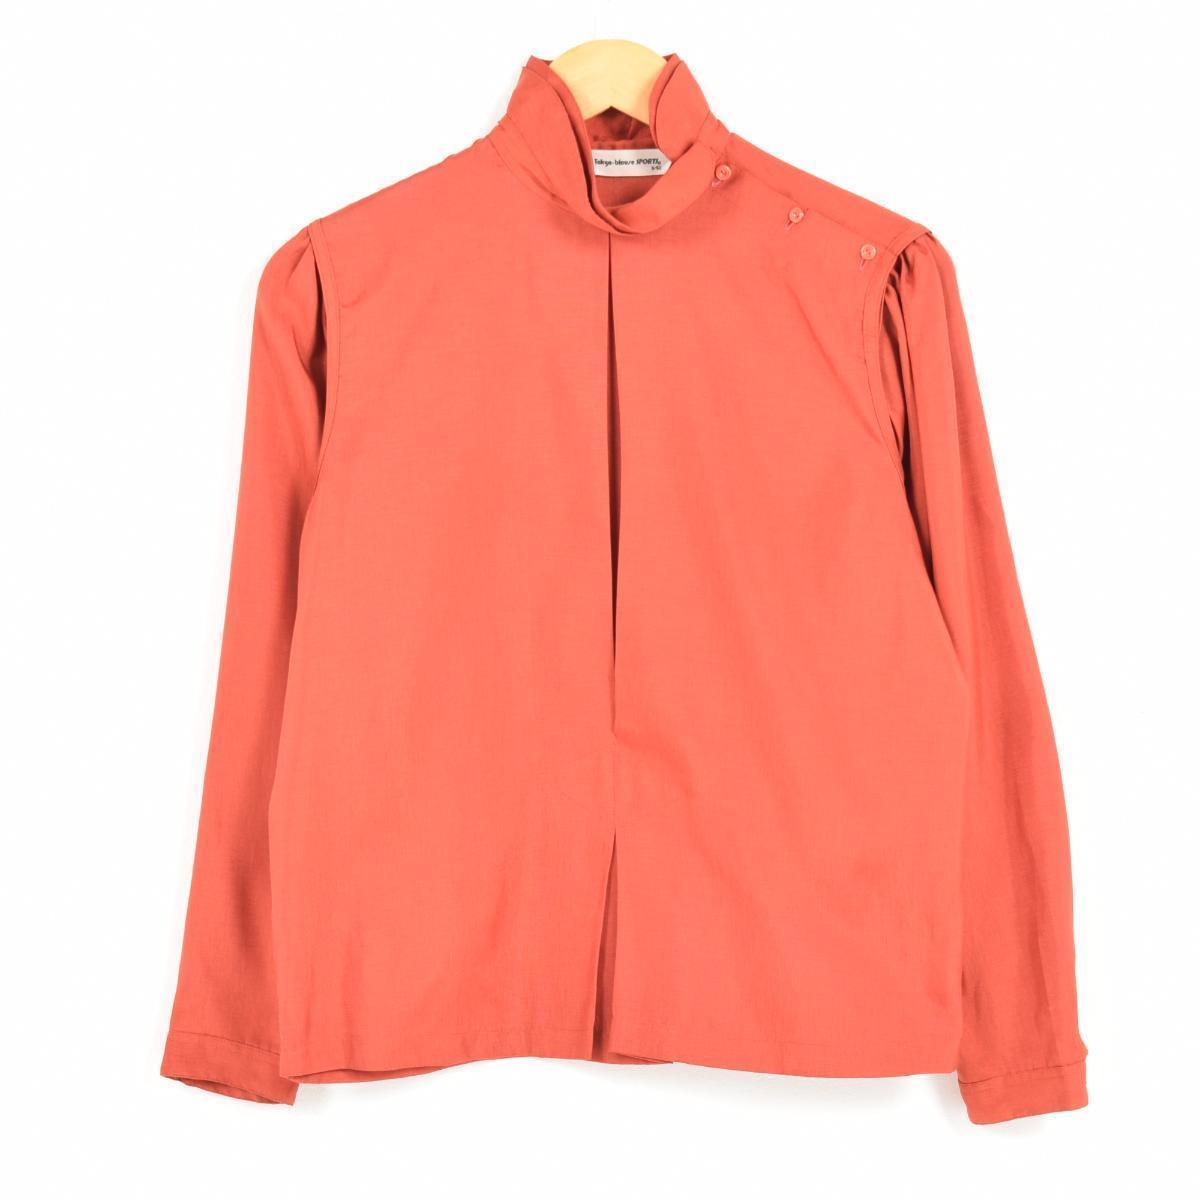 Tokyo blouse SPORTS スタンドカラー 肩ボタン 長袖 プルオーバーブラウス レディースM /wah2013 【中古】 【170901】